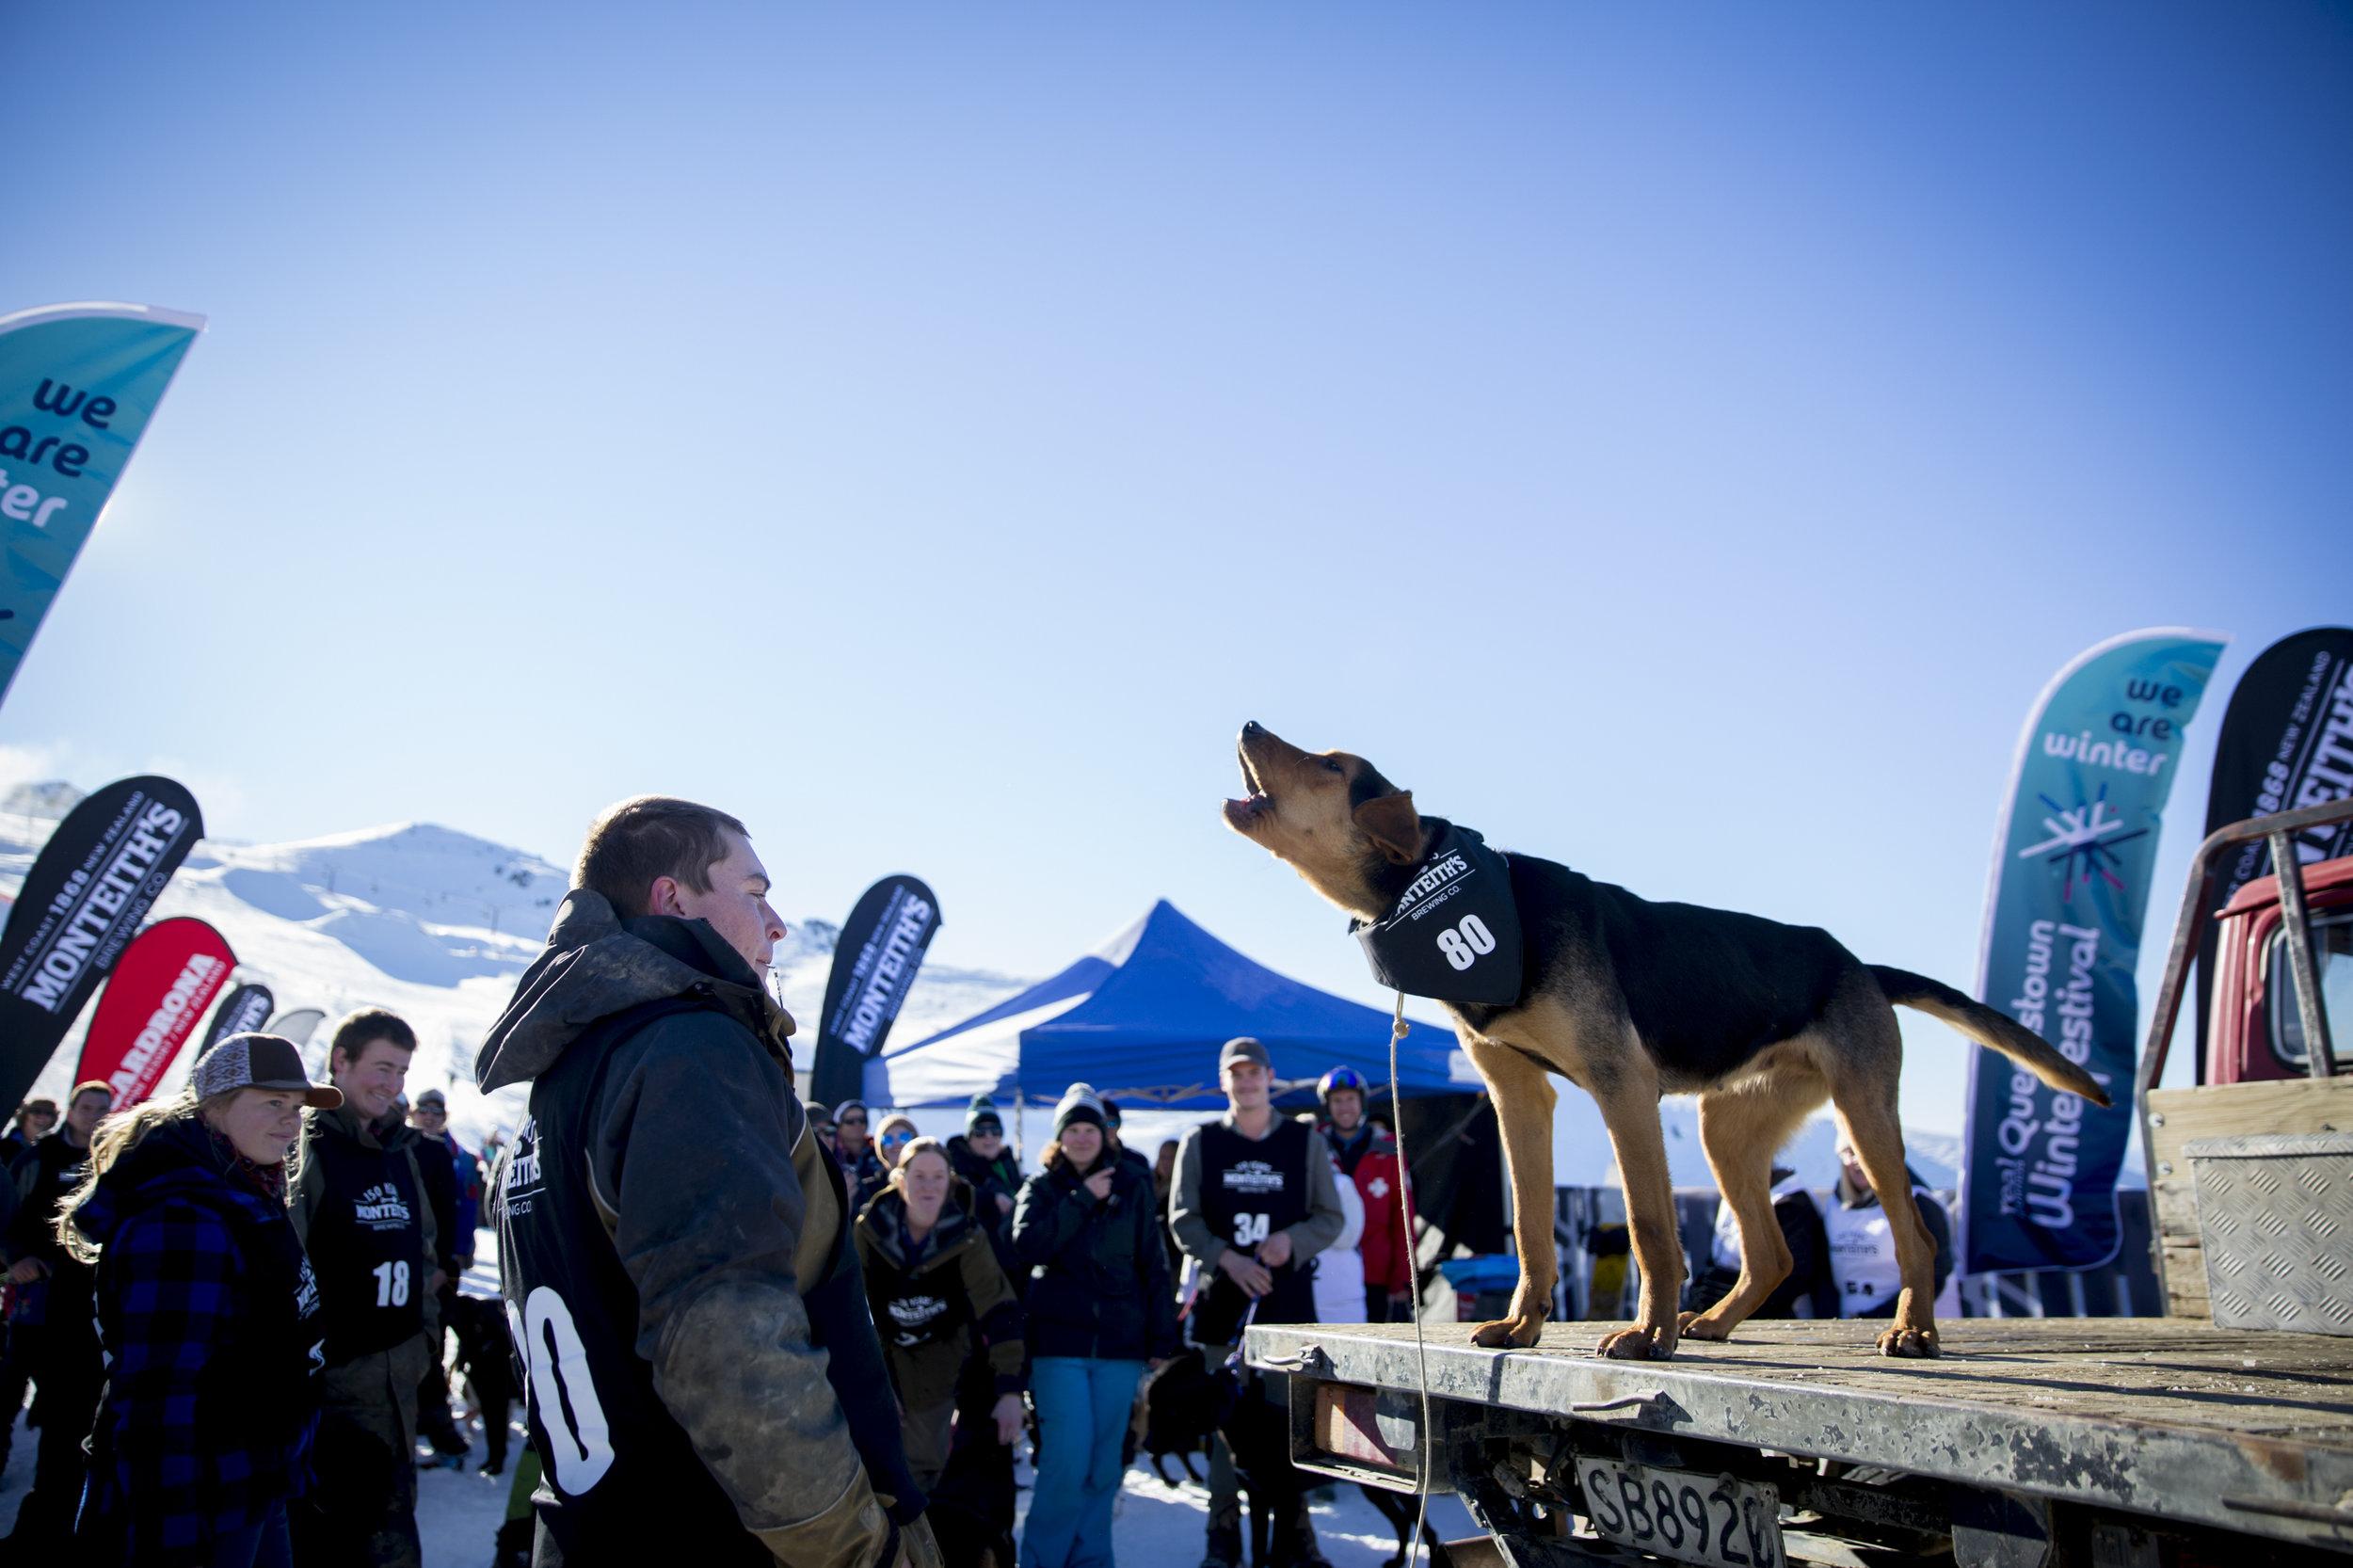 THE MONTEITH'S DOG BARKING & CARDRONA MOUNTAIN VILLAGE